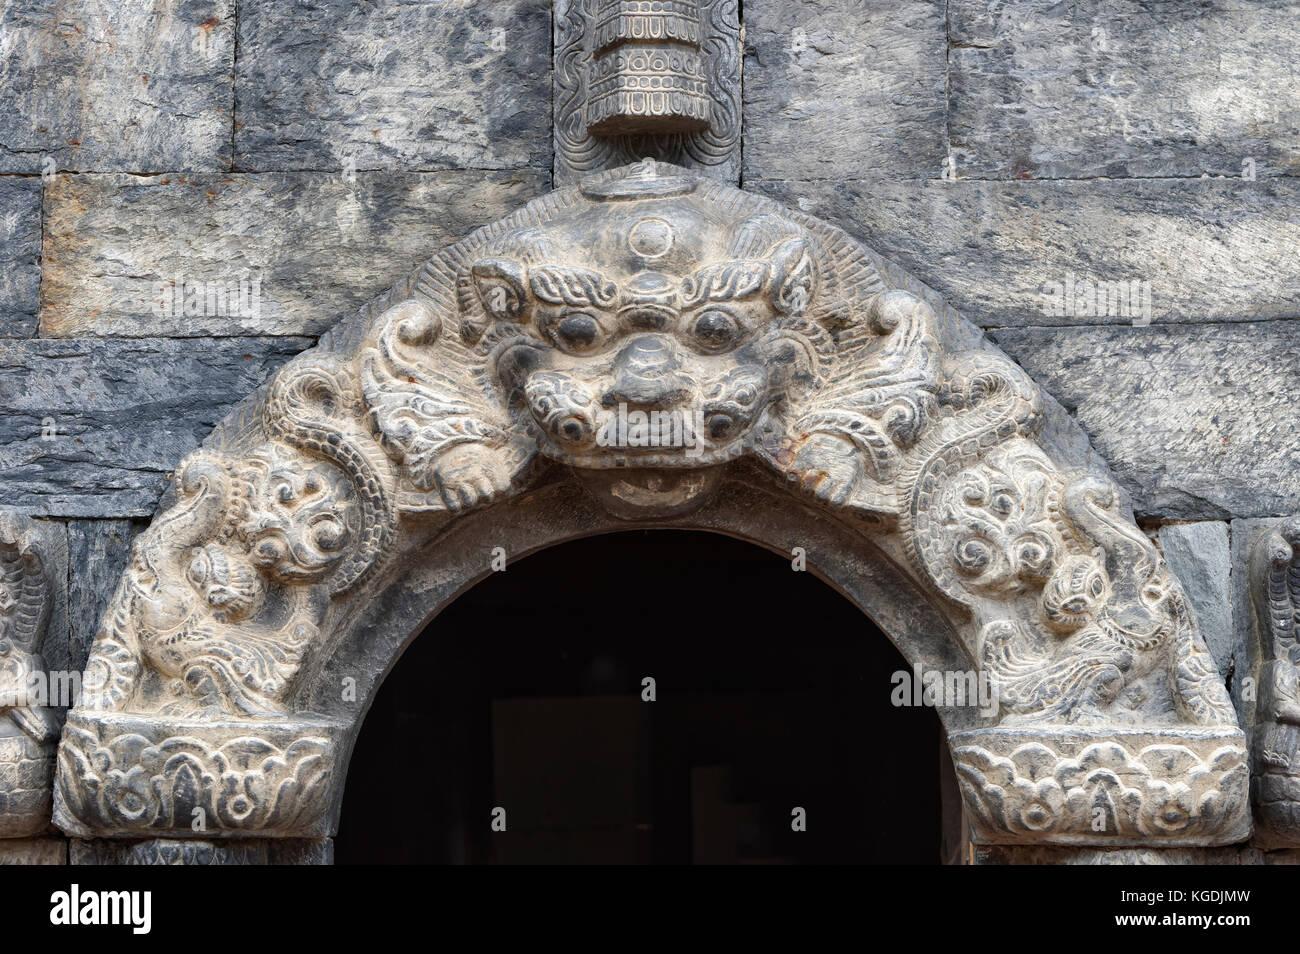 Detail of a shrine, Pashupatinath Temple, Unesco World Heritage Site, Kathmandu, Nepal - Stock Image